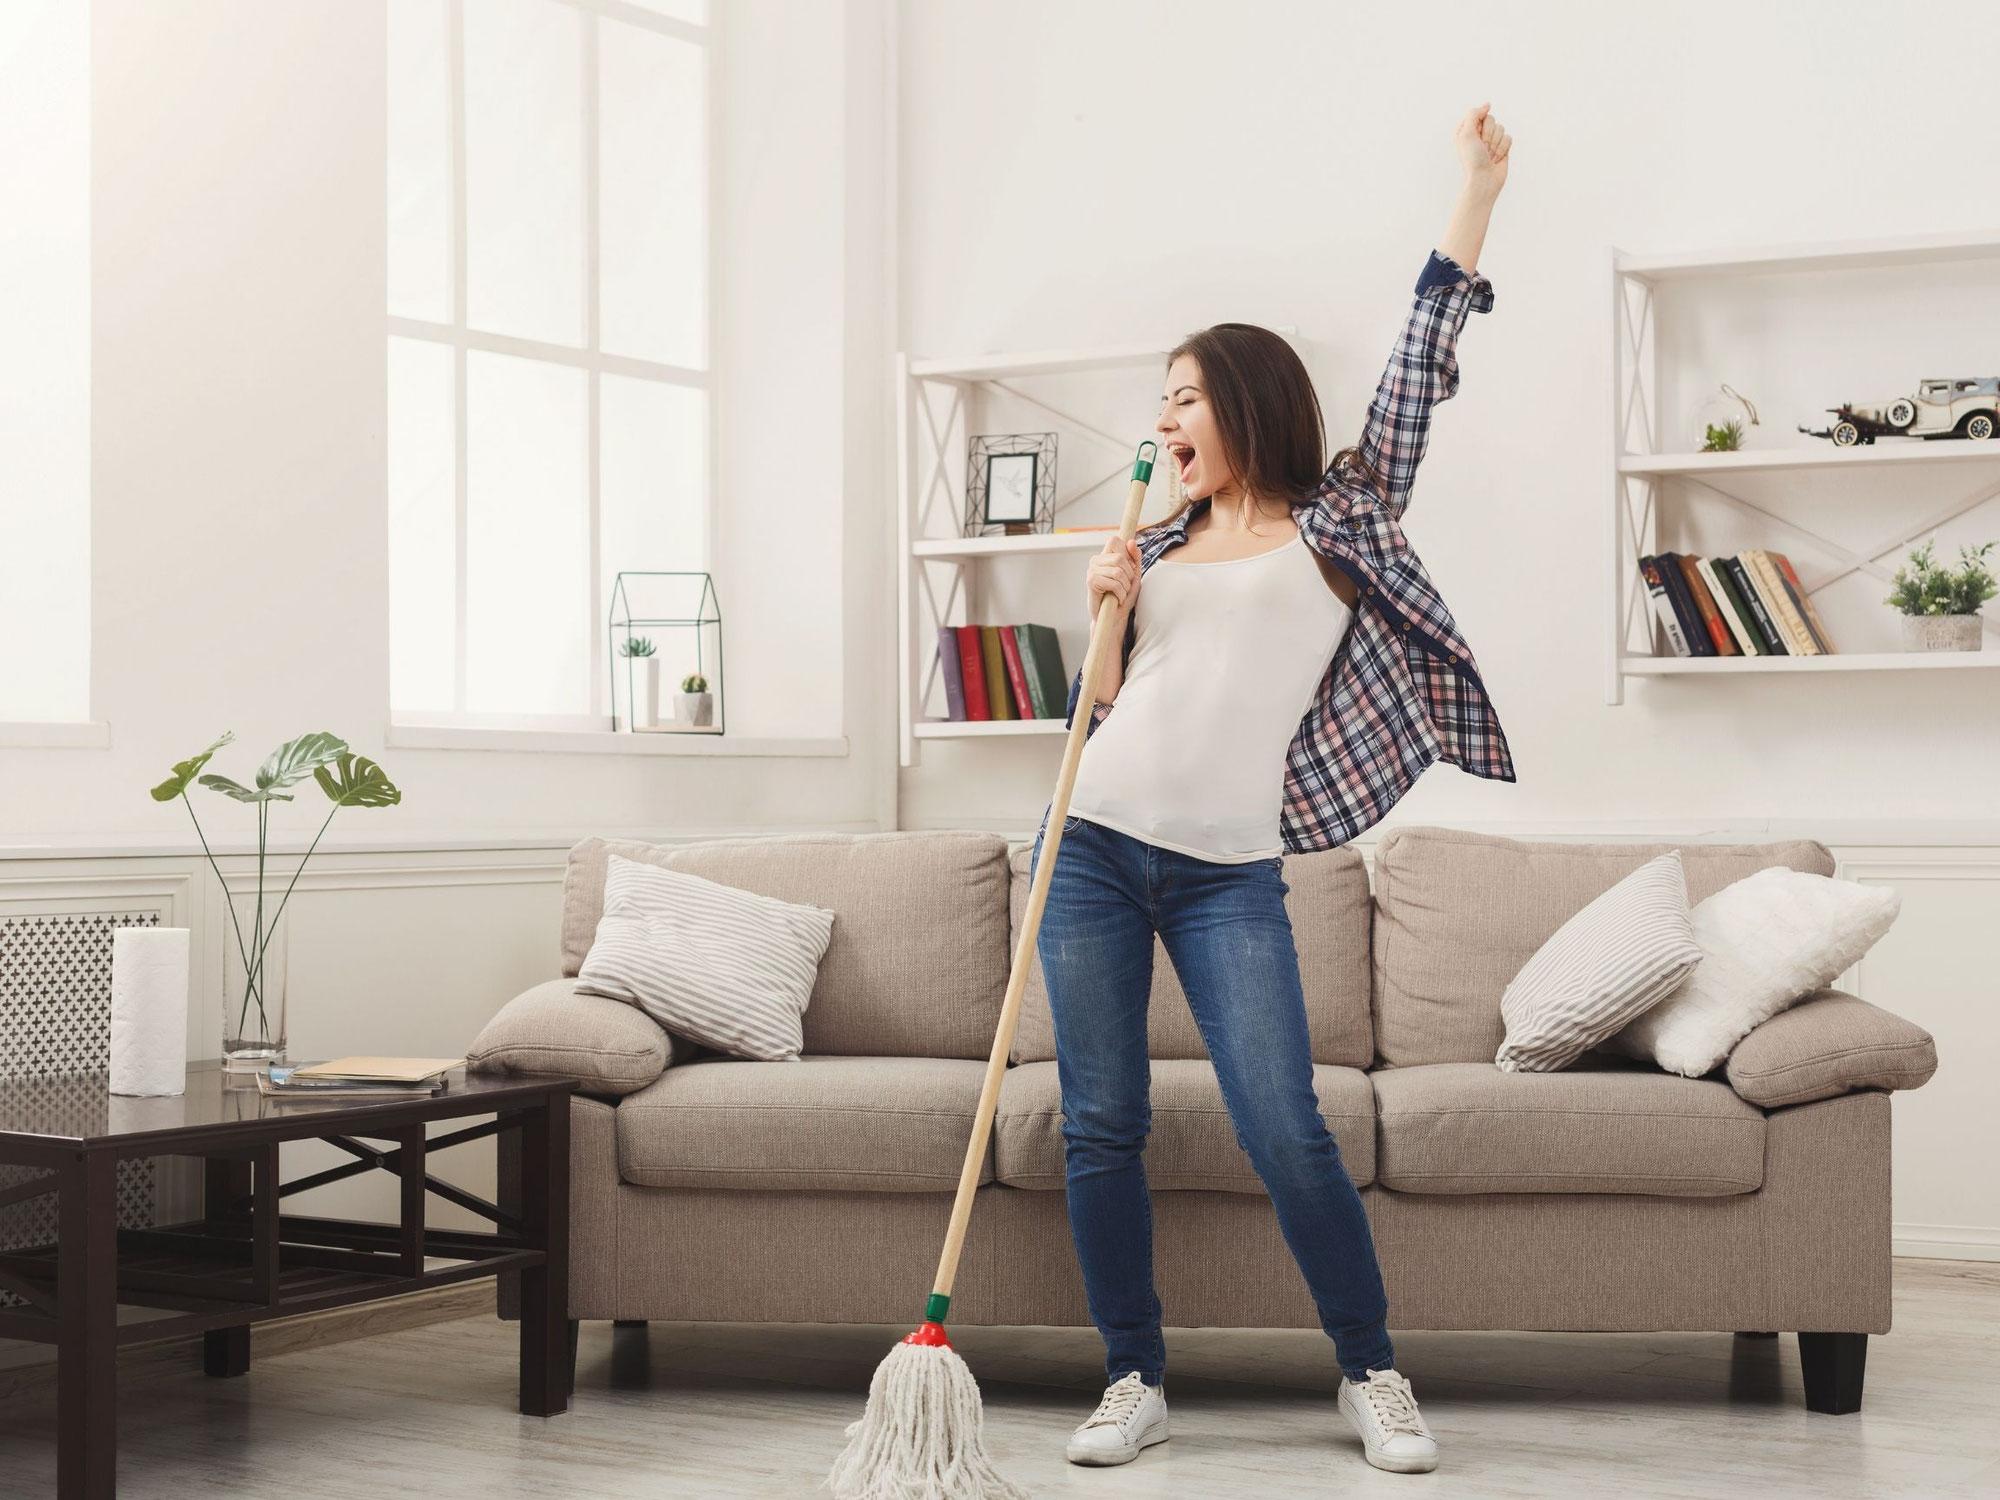 Houseworkとジンドゥーブログ継続8ヶ月とWordPress